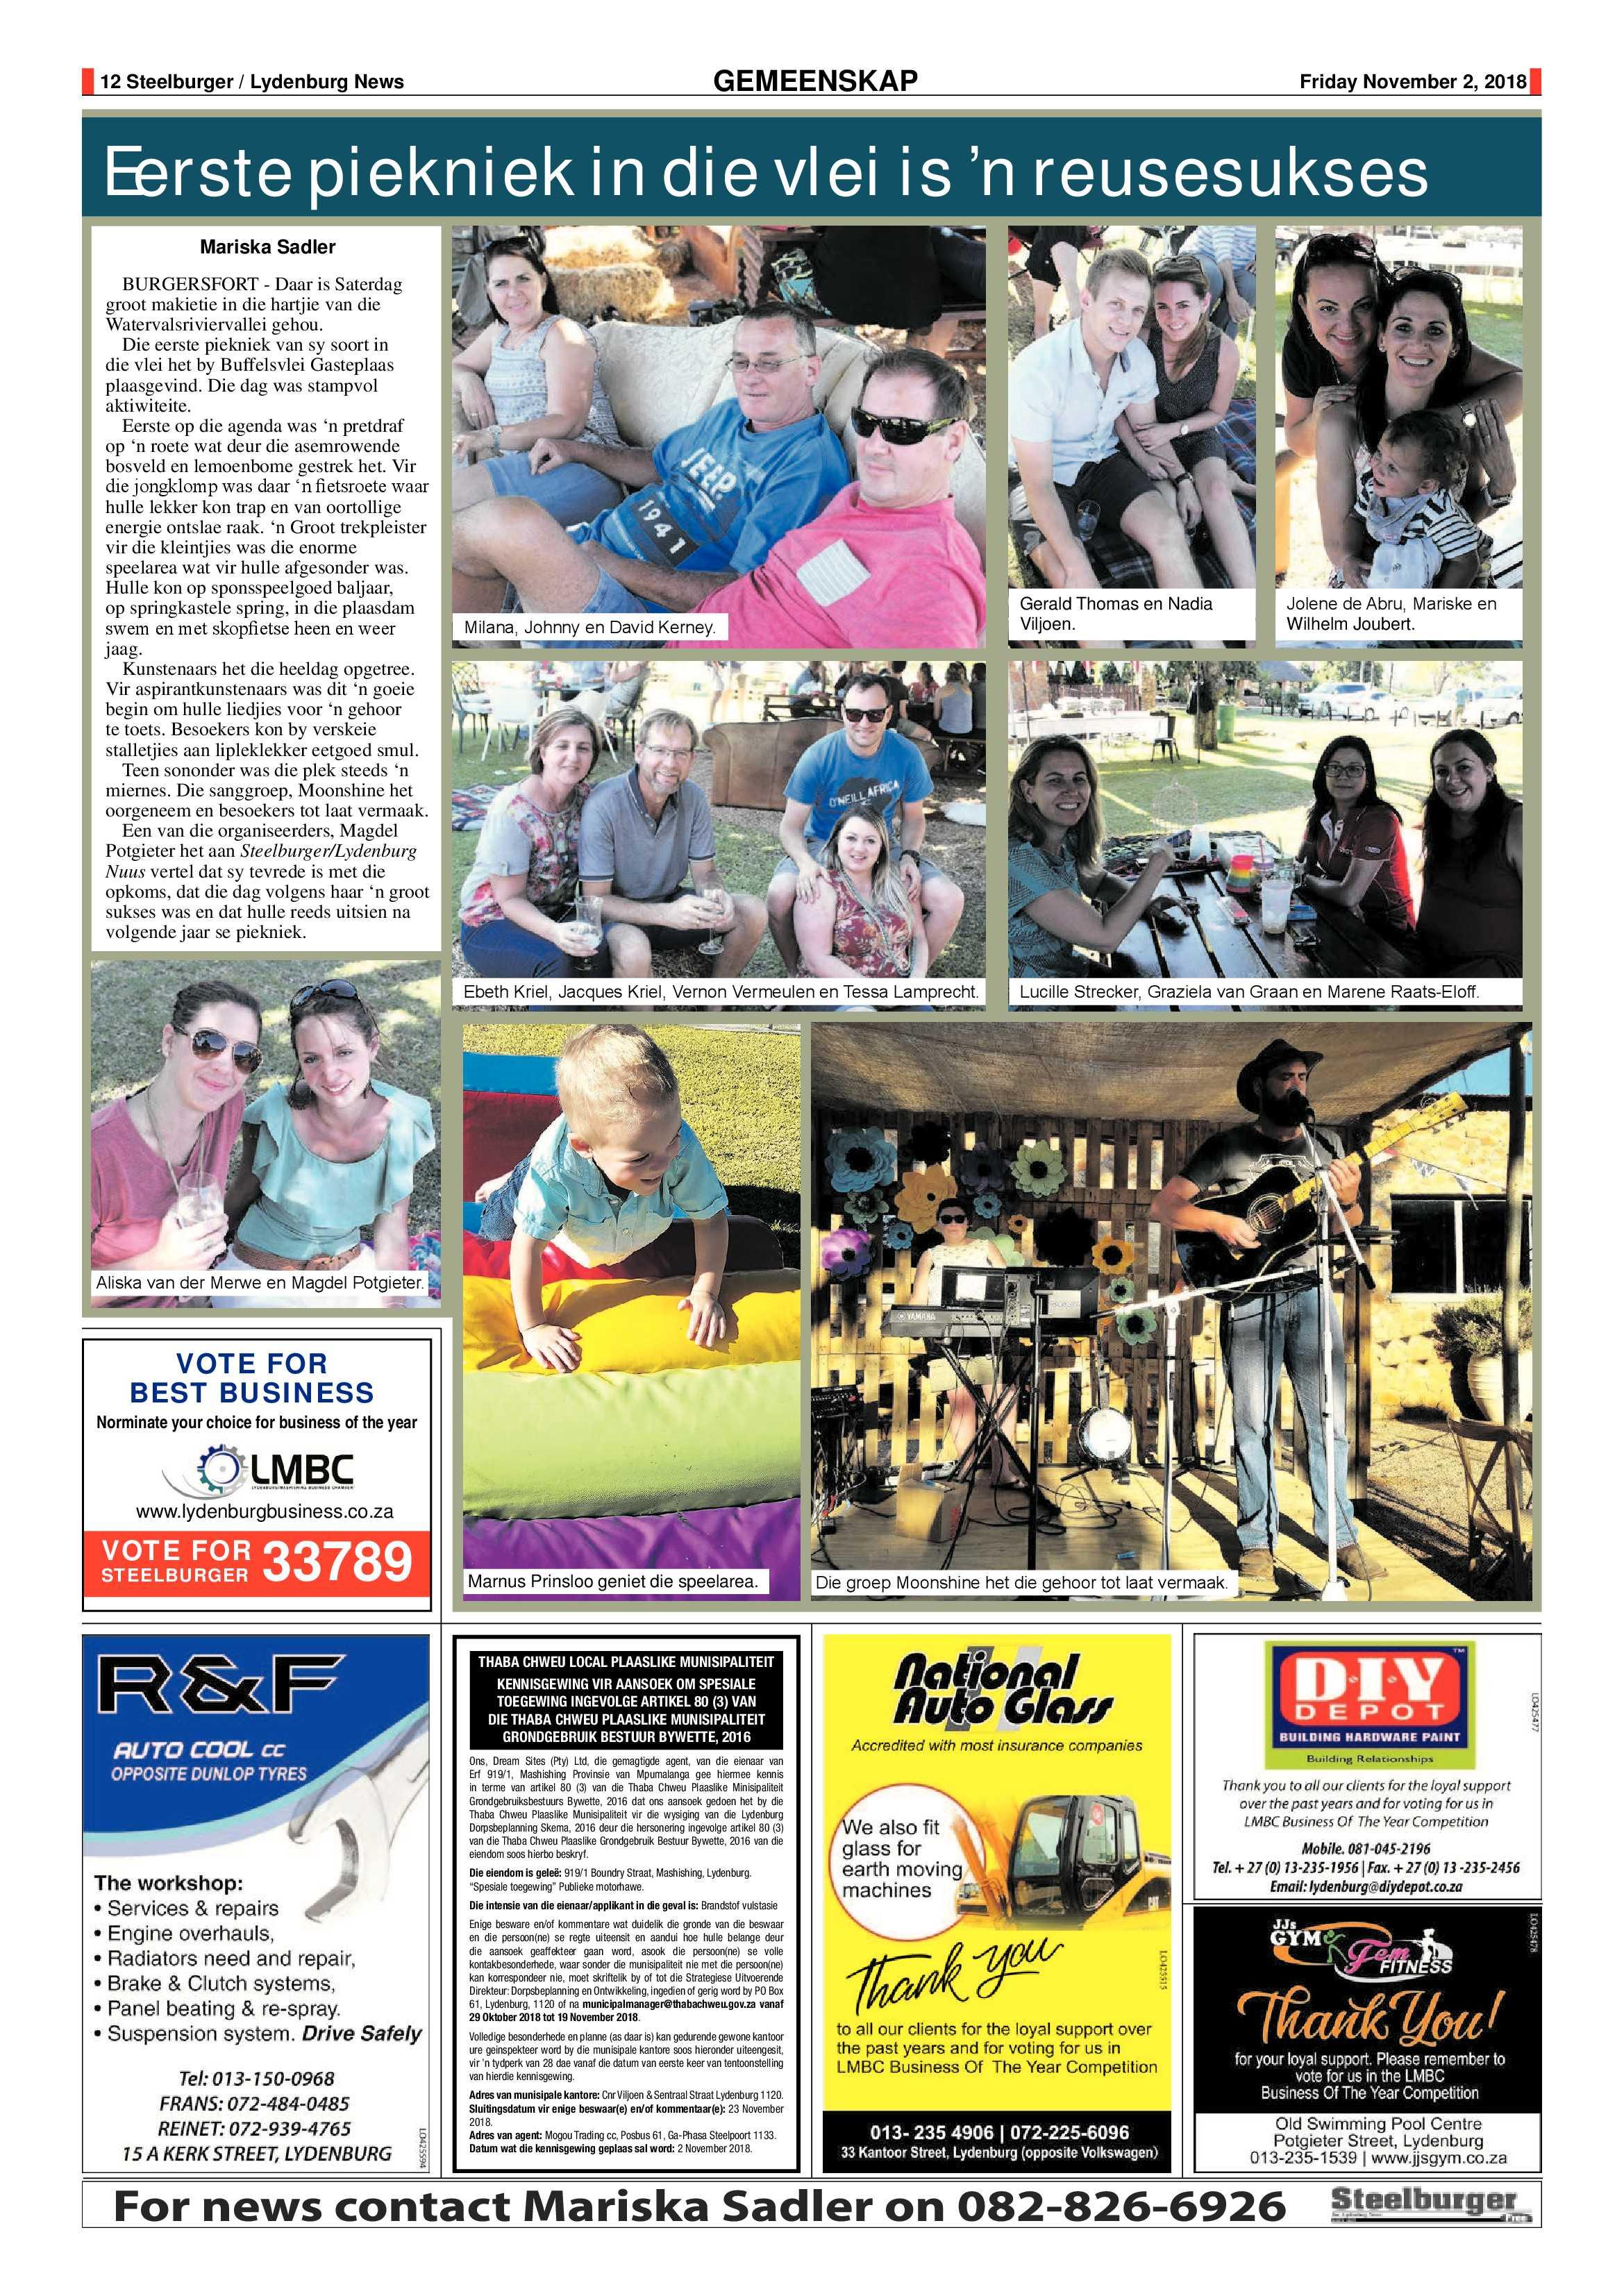 steelburger-news-2-november-2018-epapers-page-12